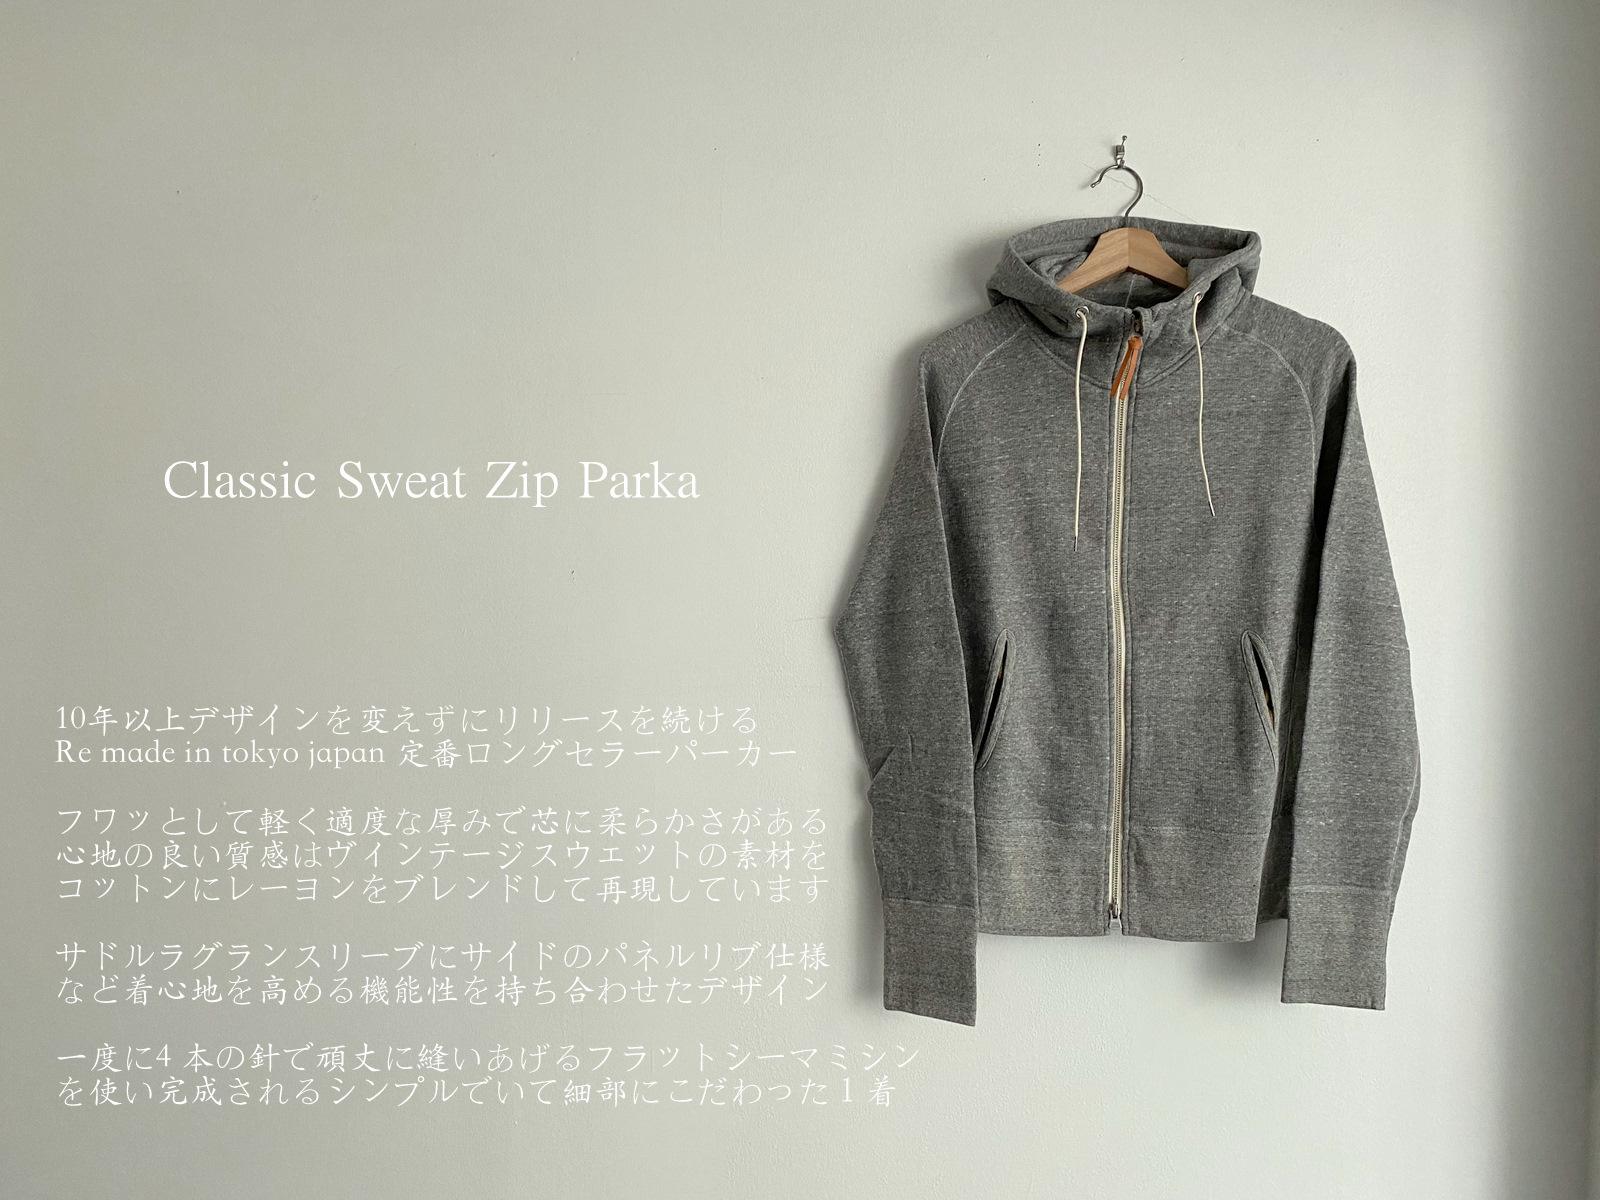 Classic Sweat Zip Parka_c0379477_12472373.jpg